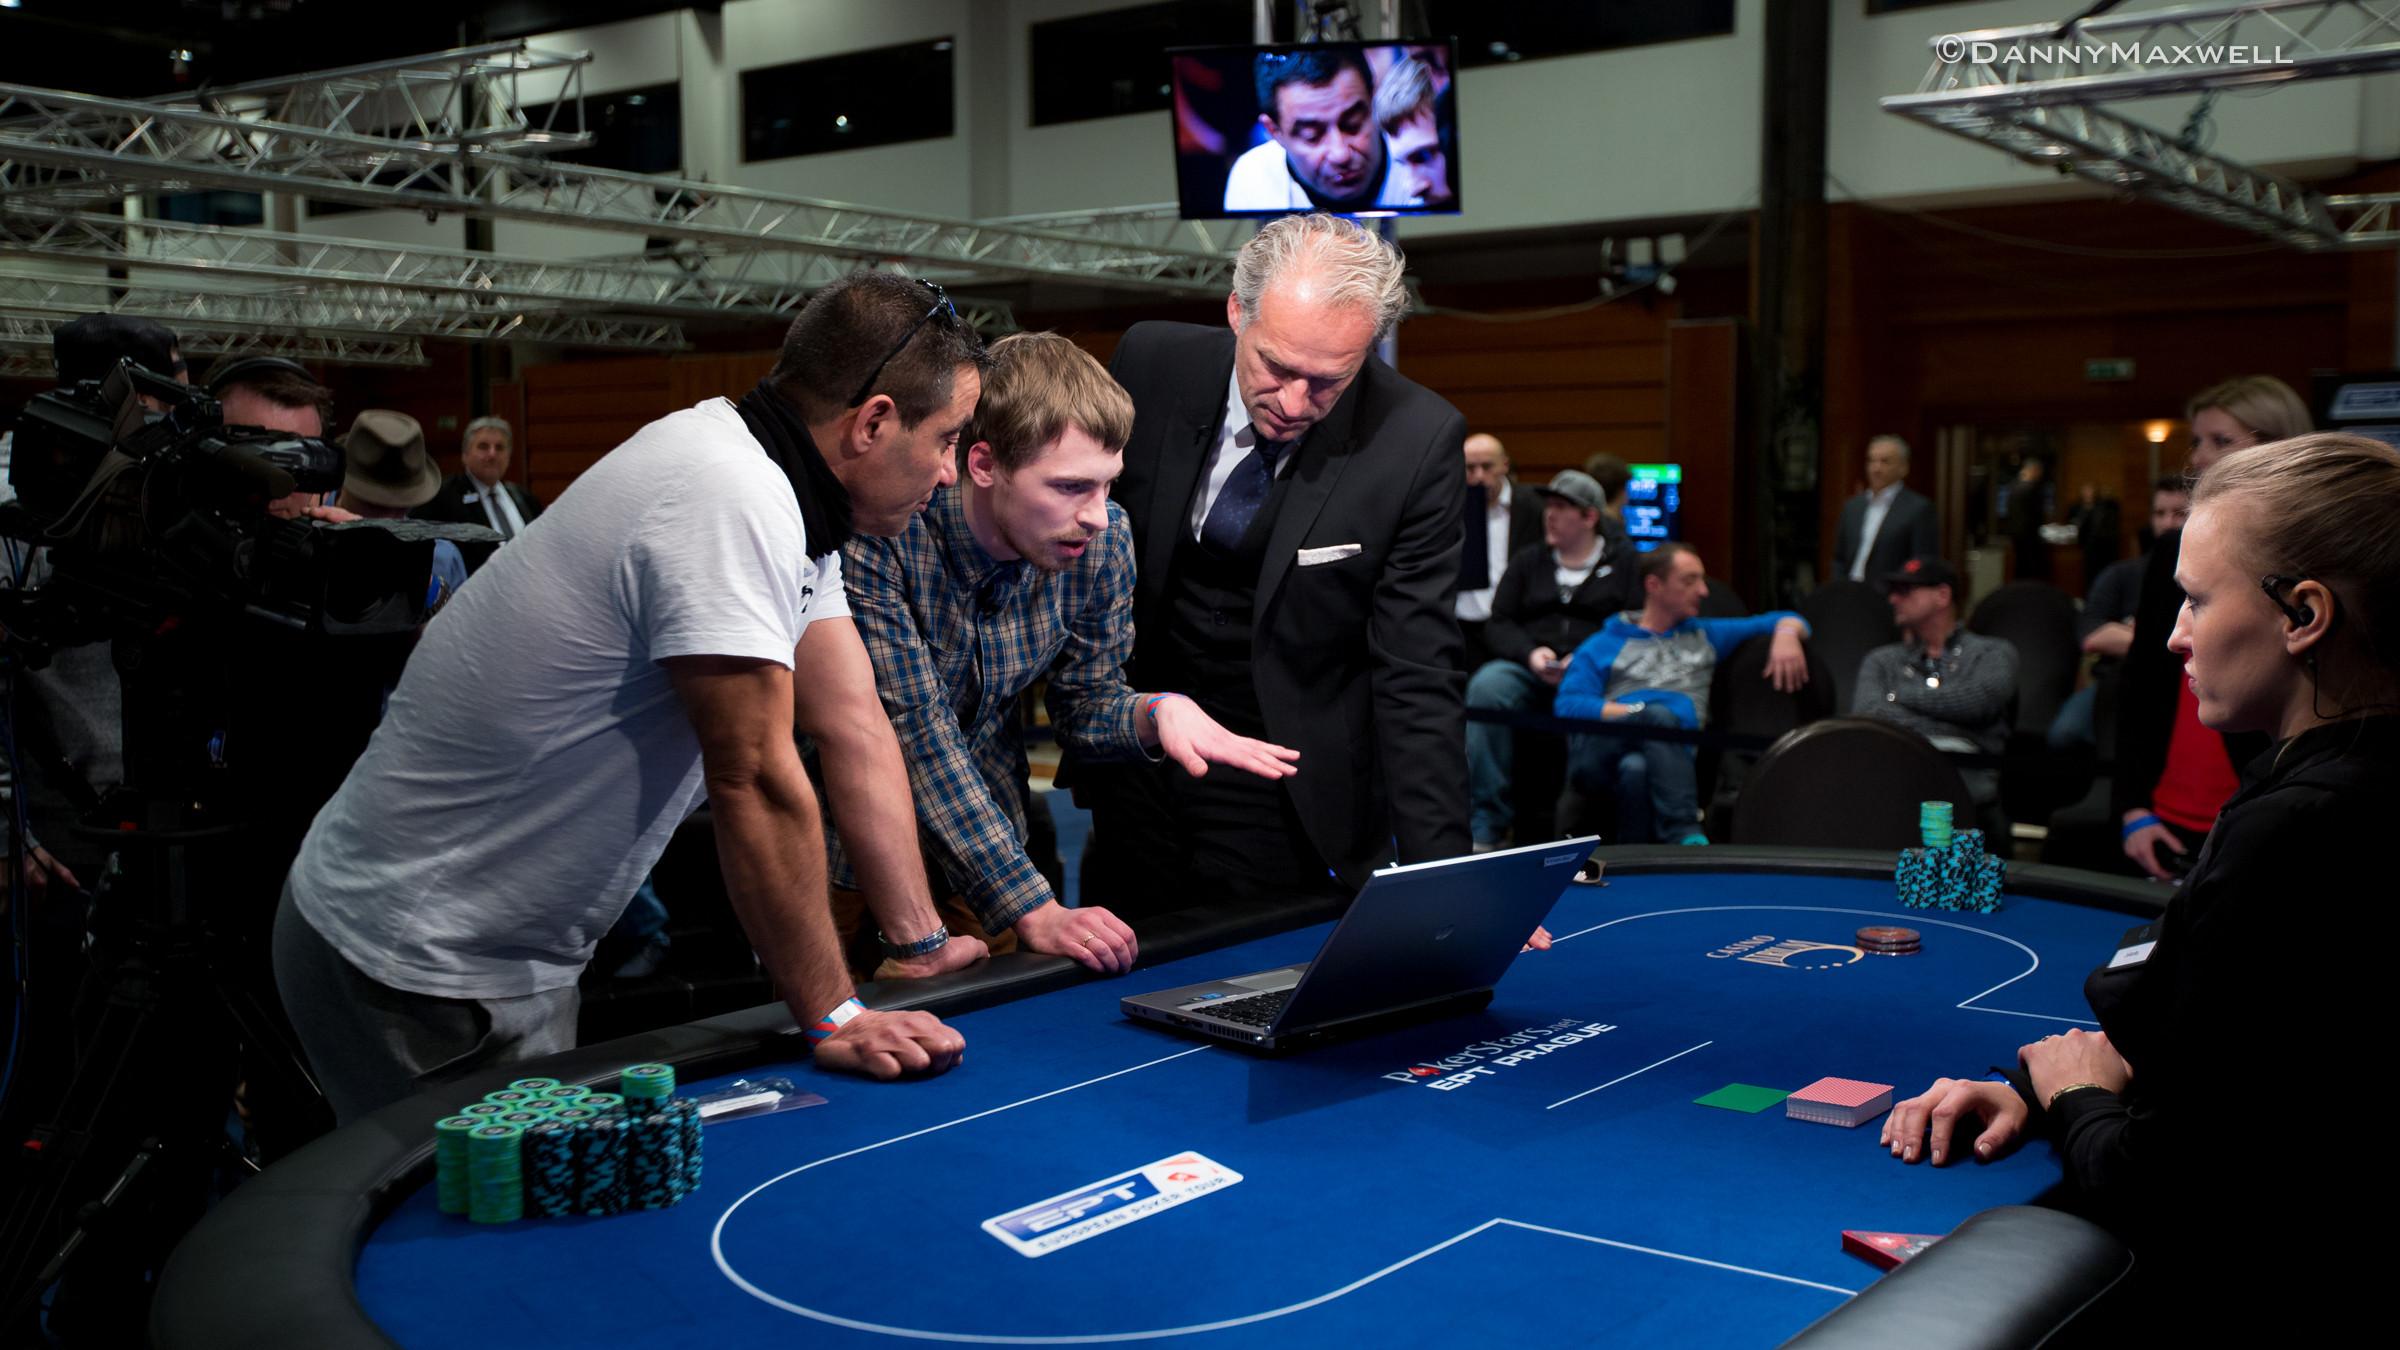 Ept prague le replay vid o de la table finale pokernews for Table 19 streaming